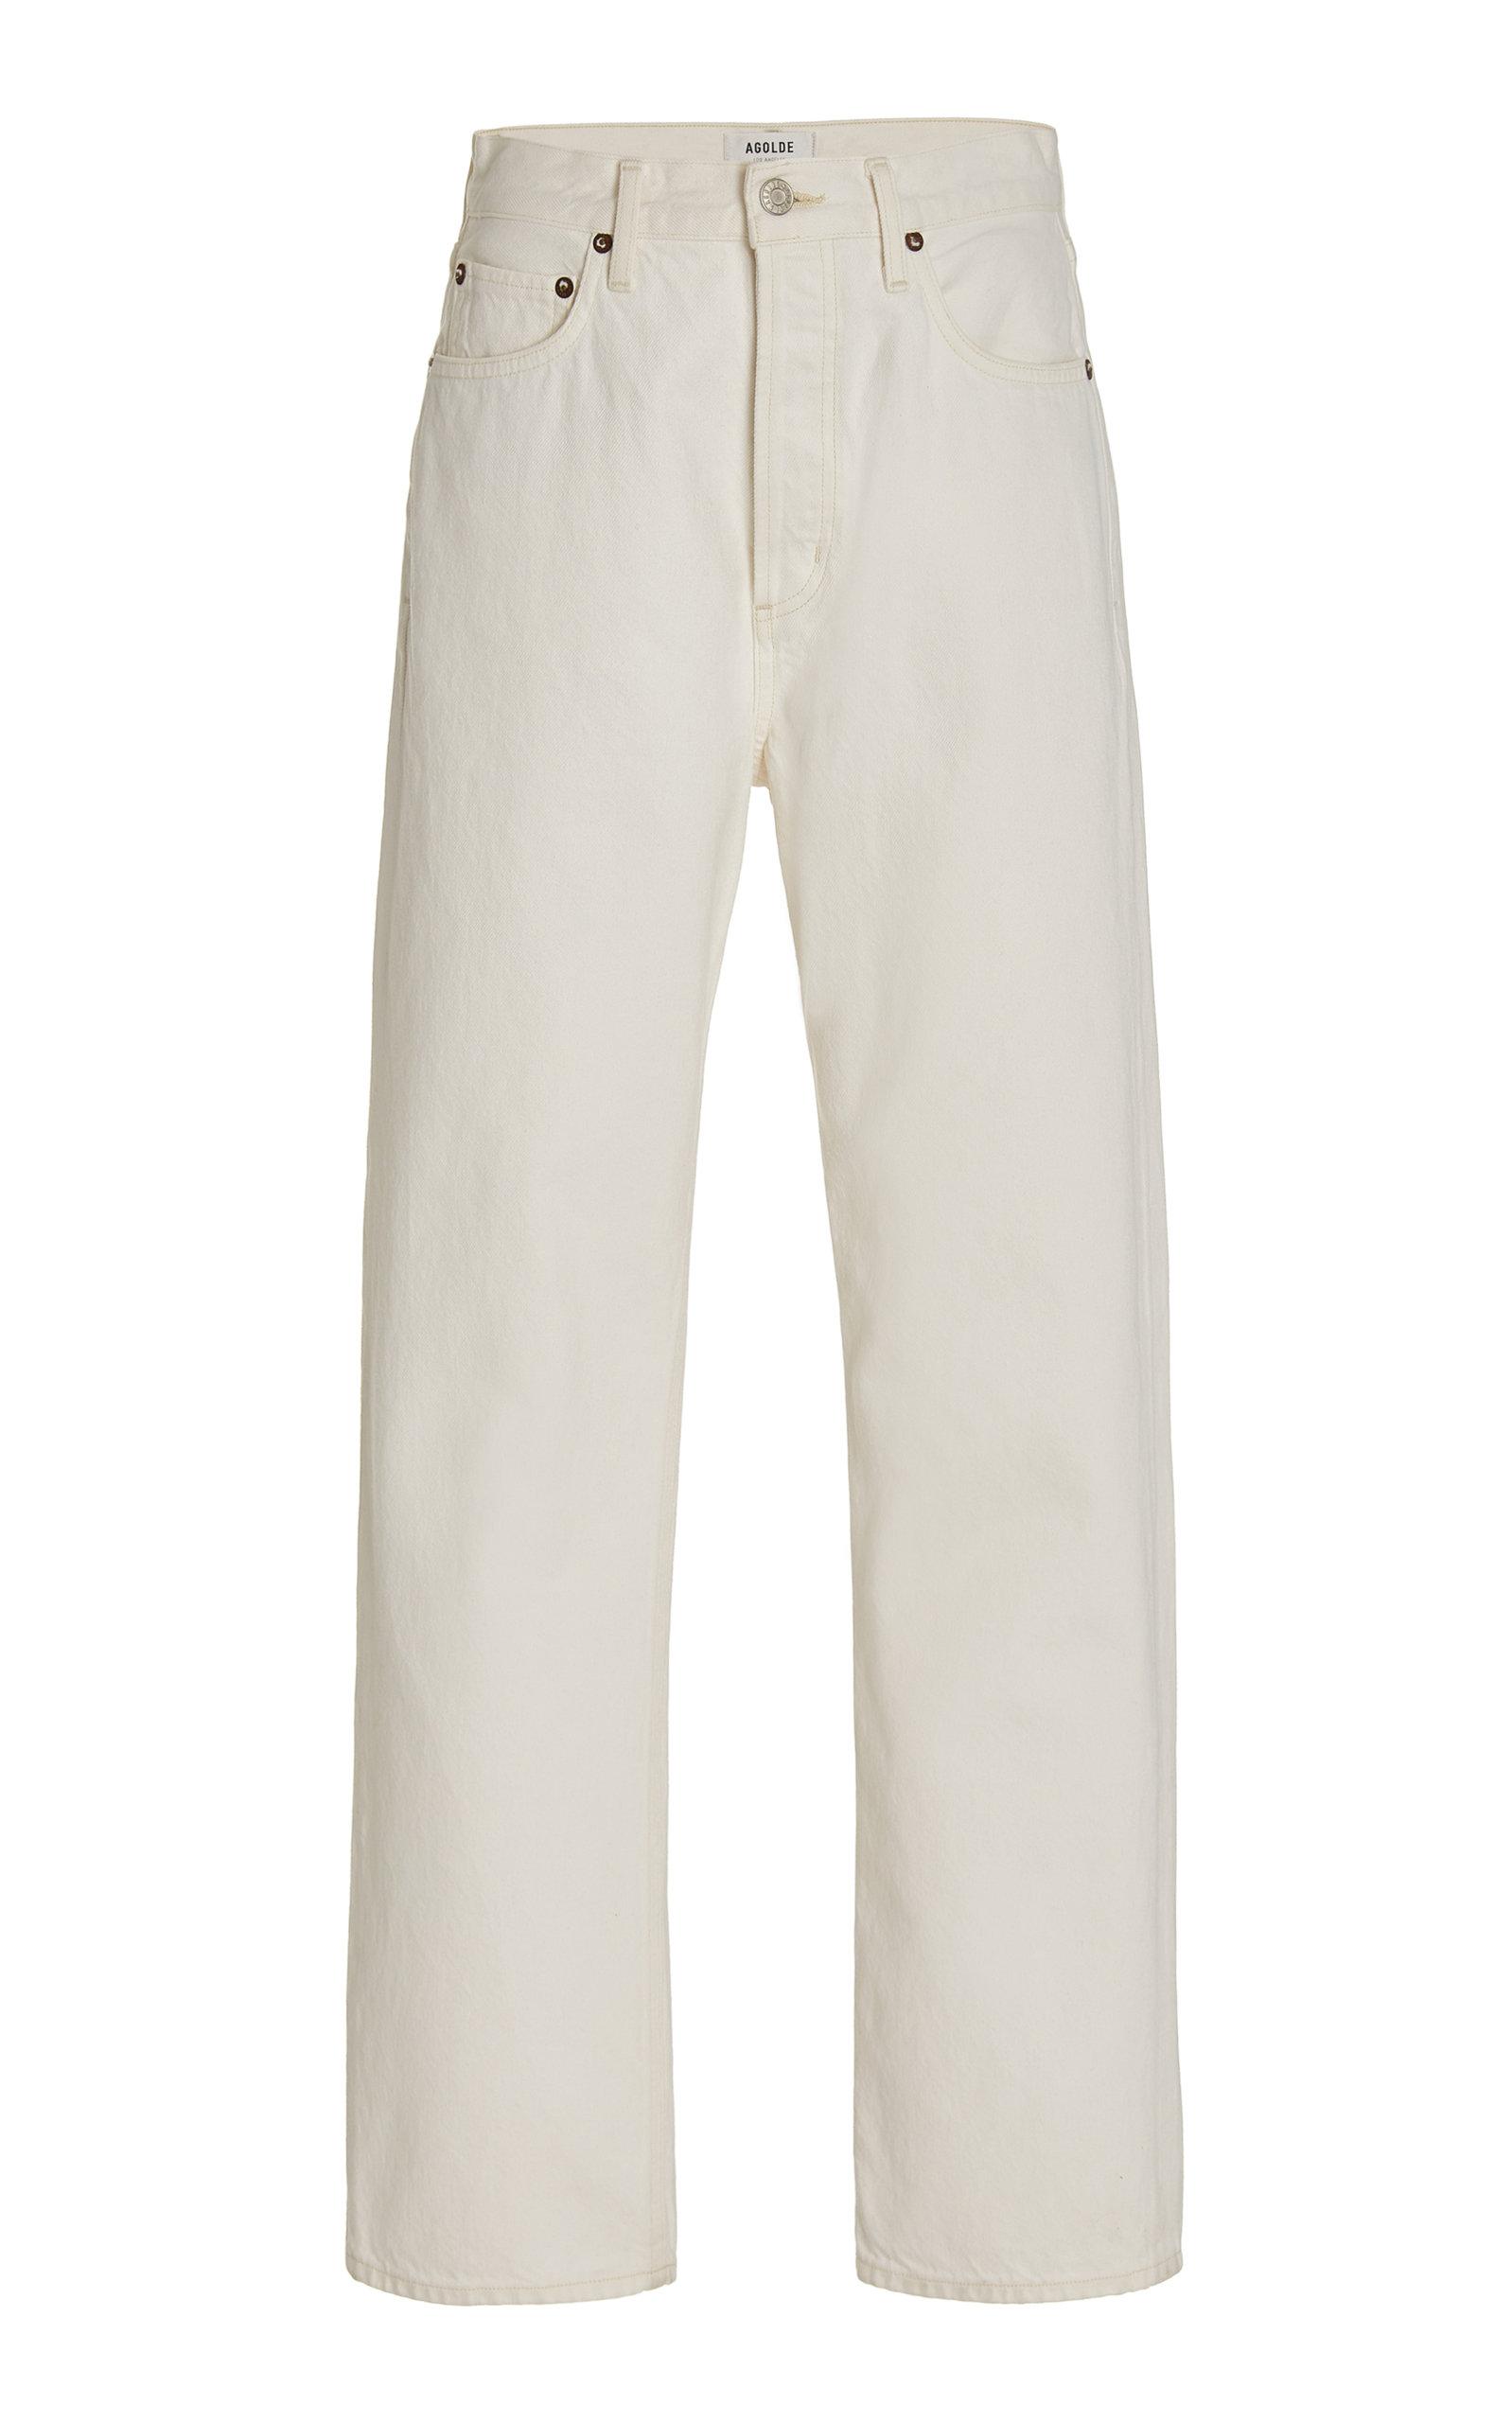 Agolde - Women's 90's Pinch-Waist Rigid High-Rise Straight-Leg Jeans - White - Moda Operandi